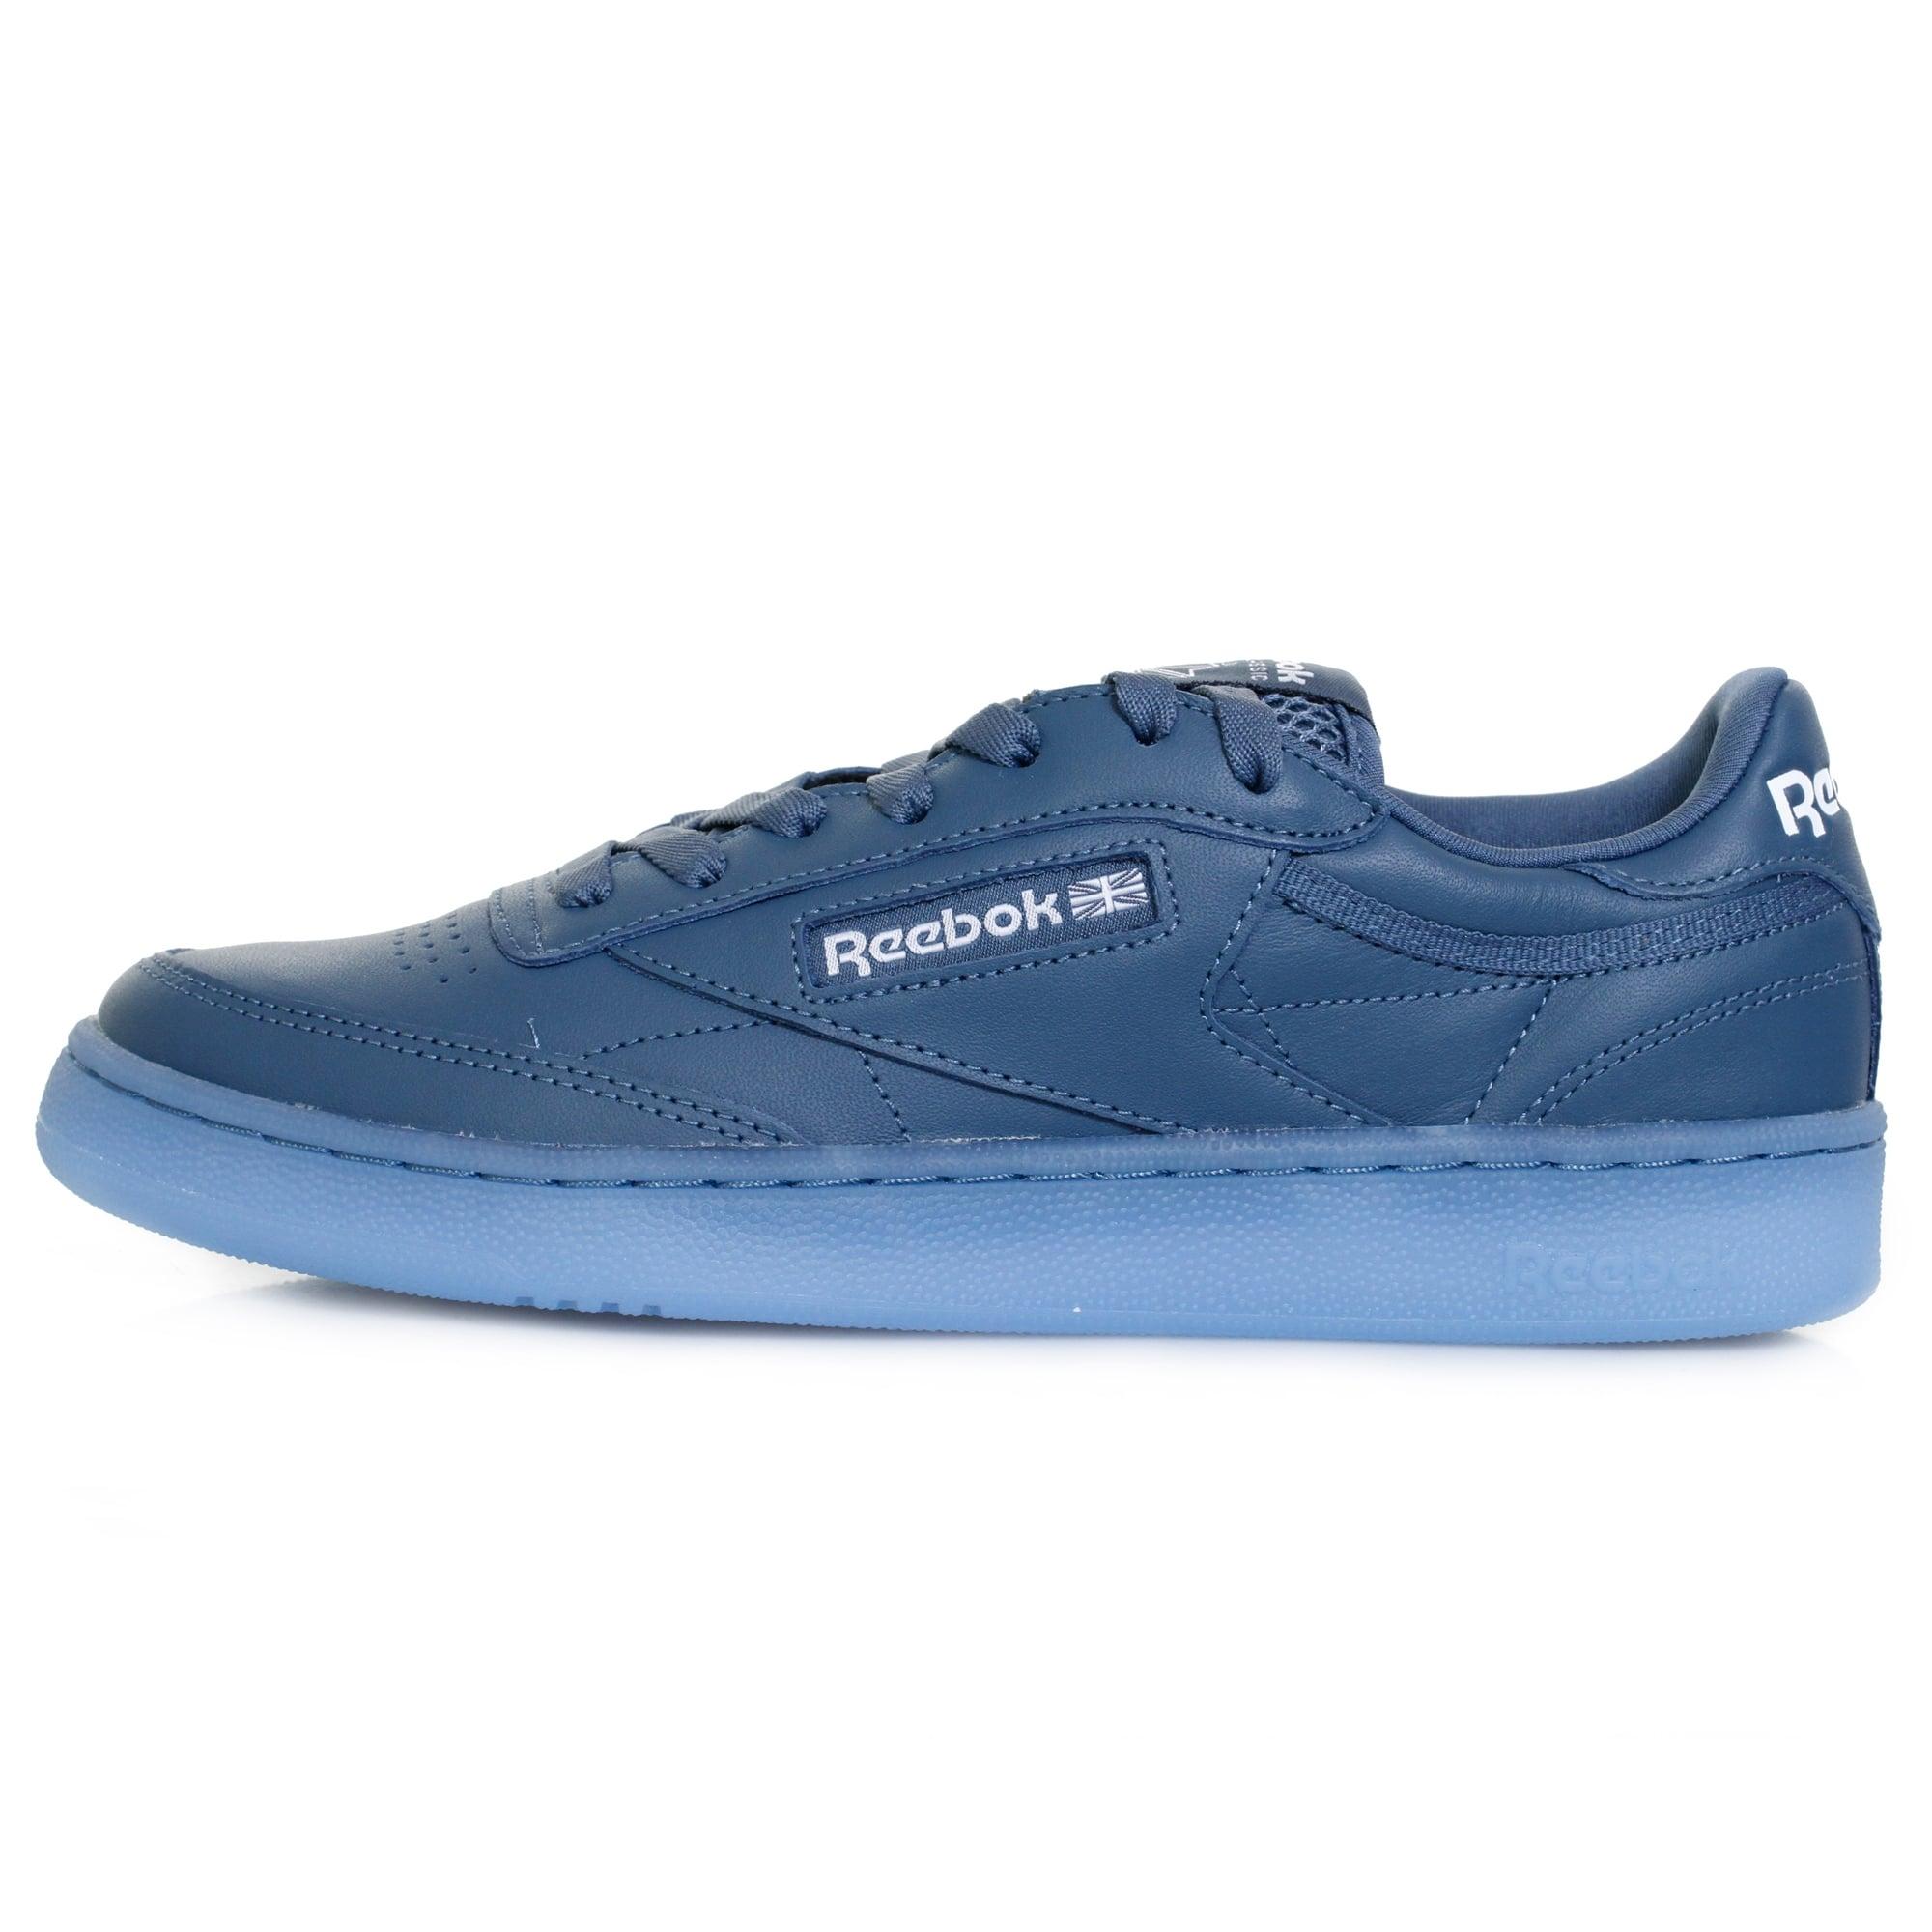 070c8d1185a Reebok Club C85 Ice Blue Shoe BD1672